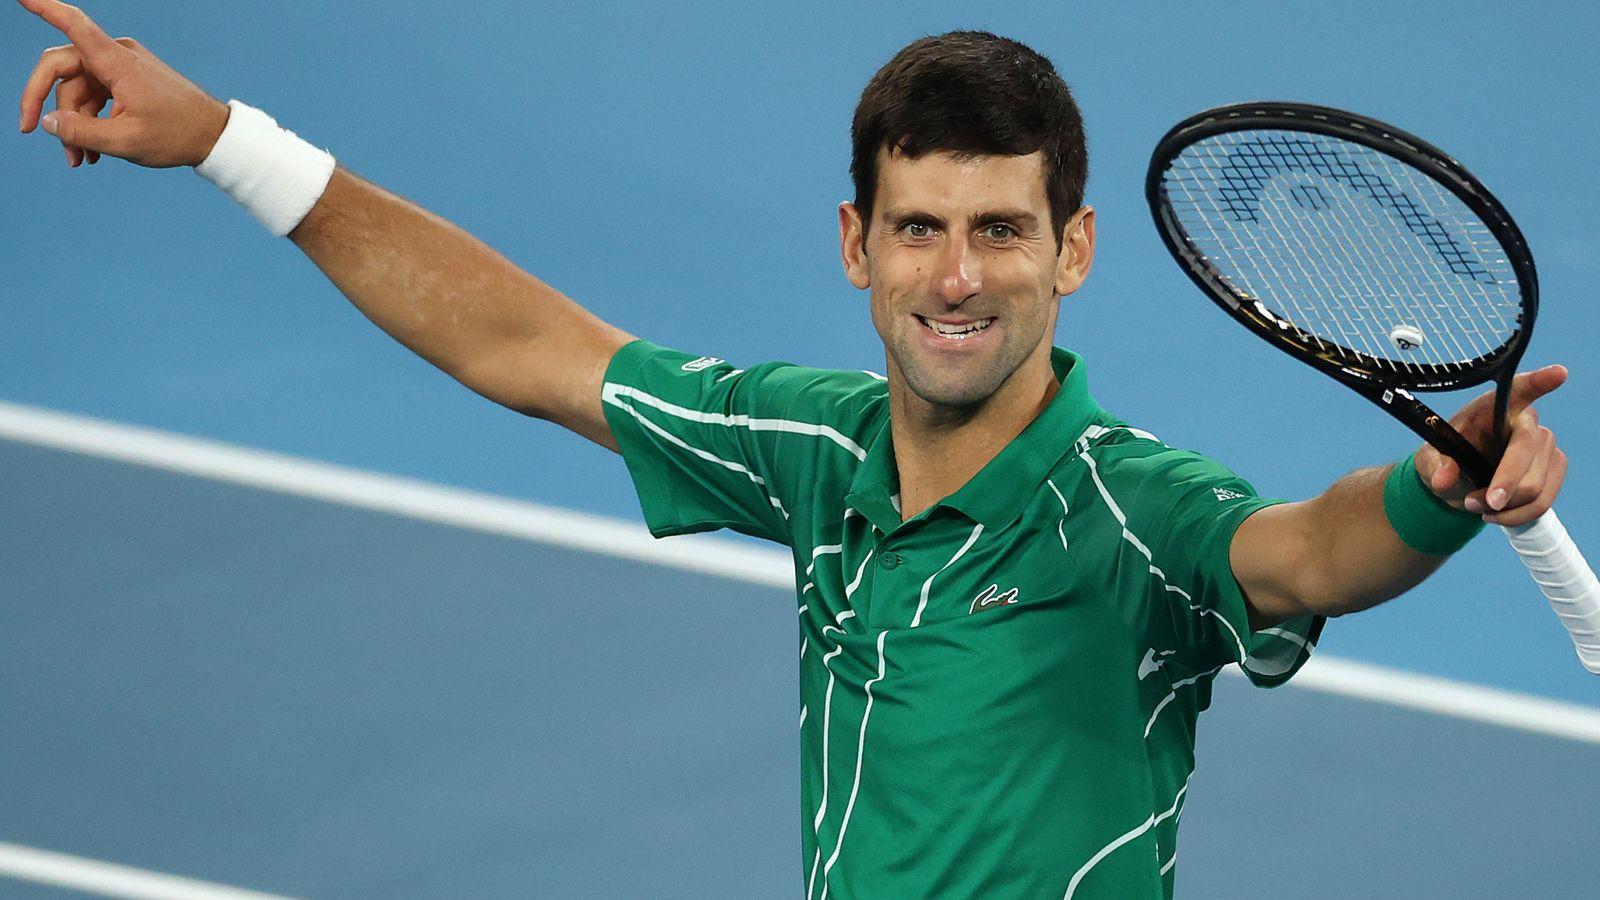 Novak Djokovic Lands Eighth Australian Open Title And 17th